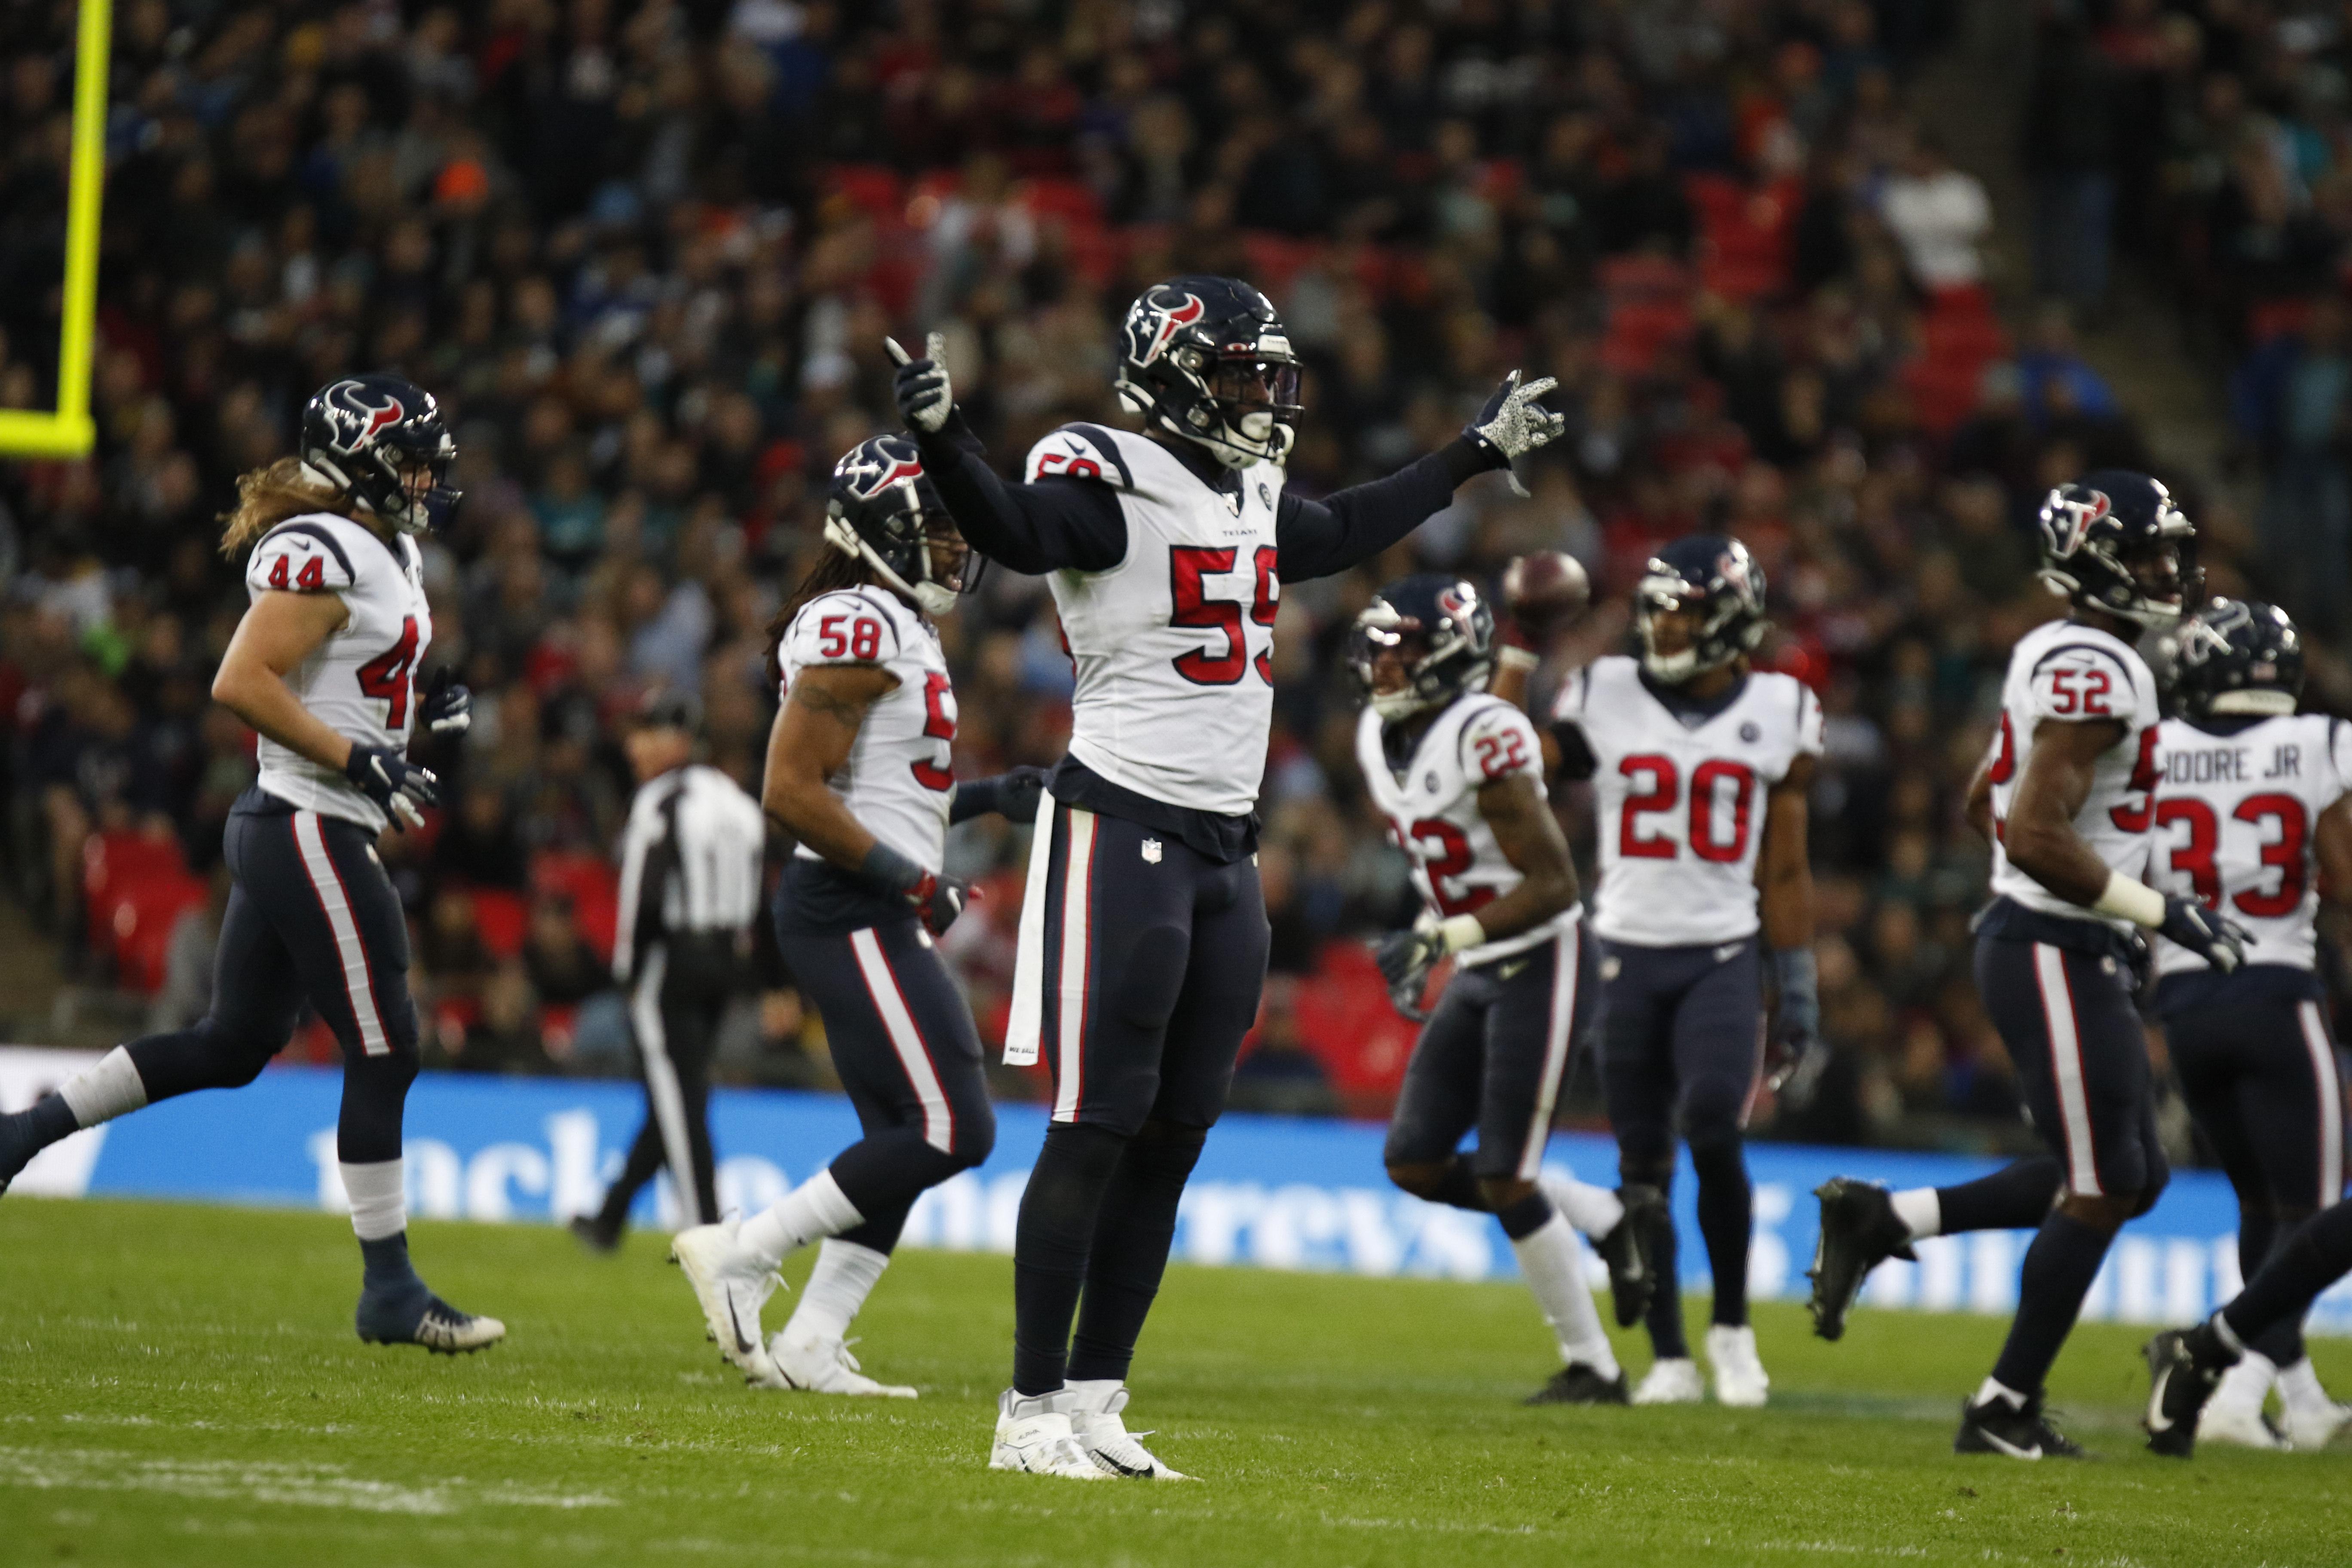 NFL: NOV 03 Texans v Jaguars